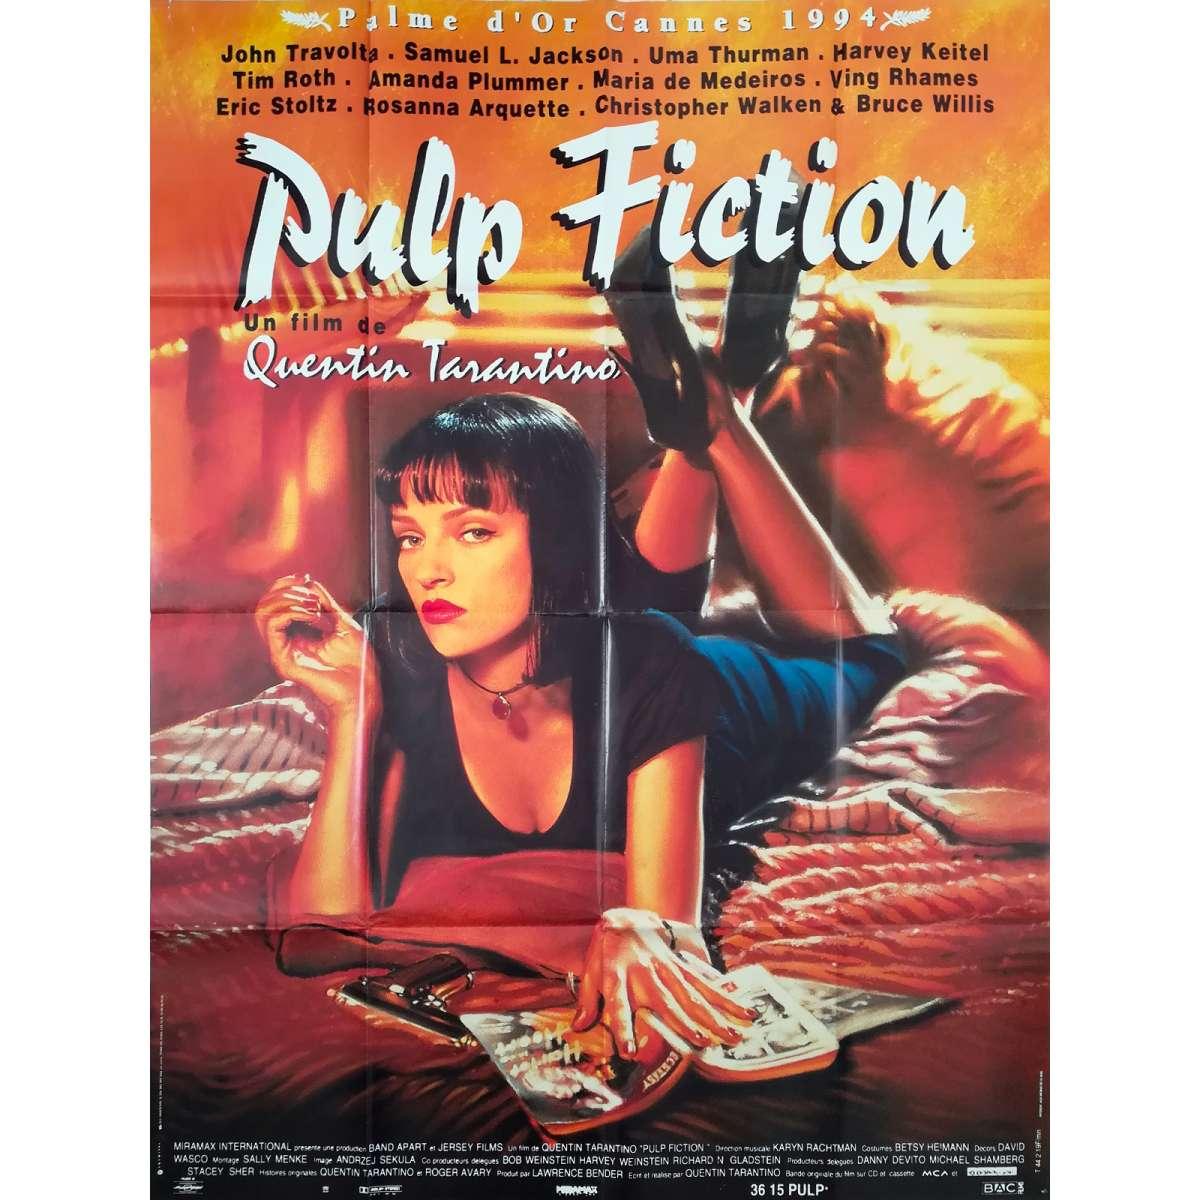 PULP FICTION Rare Original Movie Poster   20x20 in.   20   Quentin  Tarantino